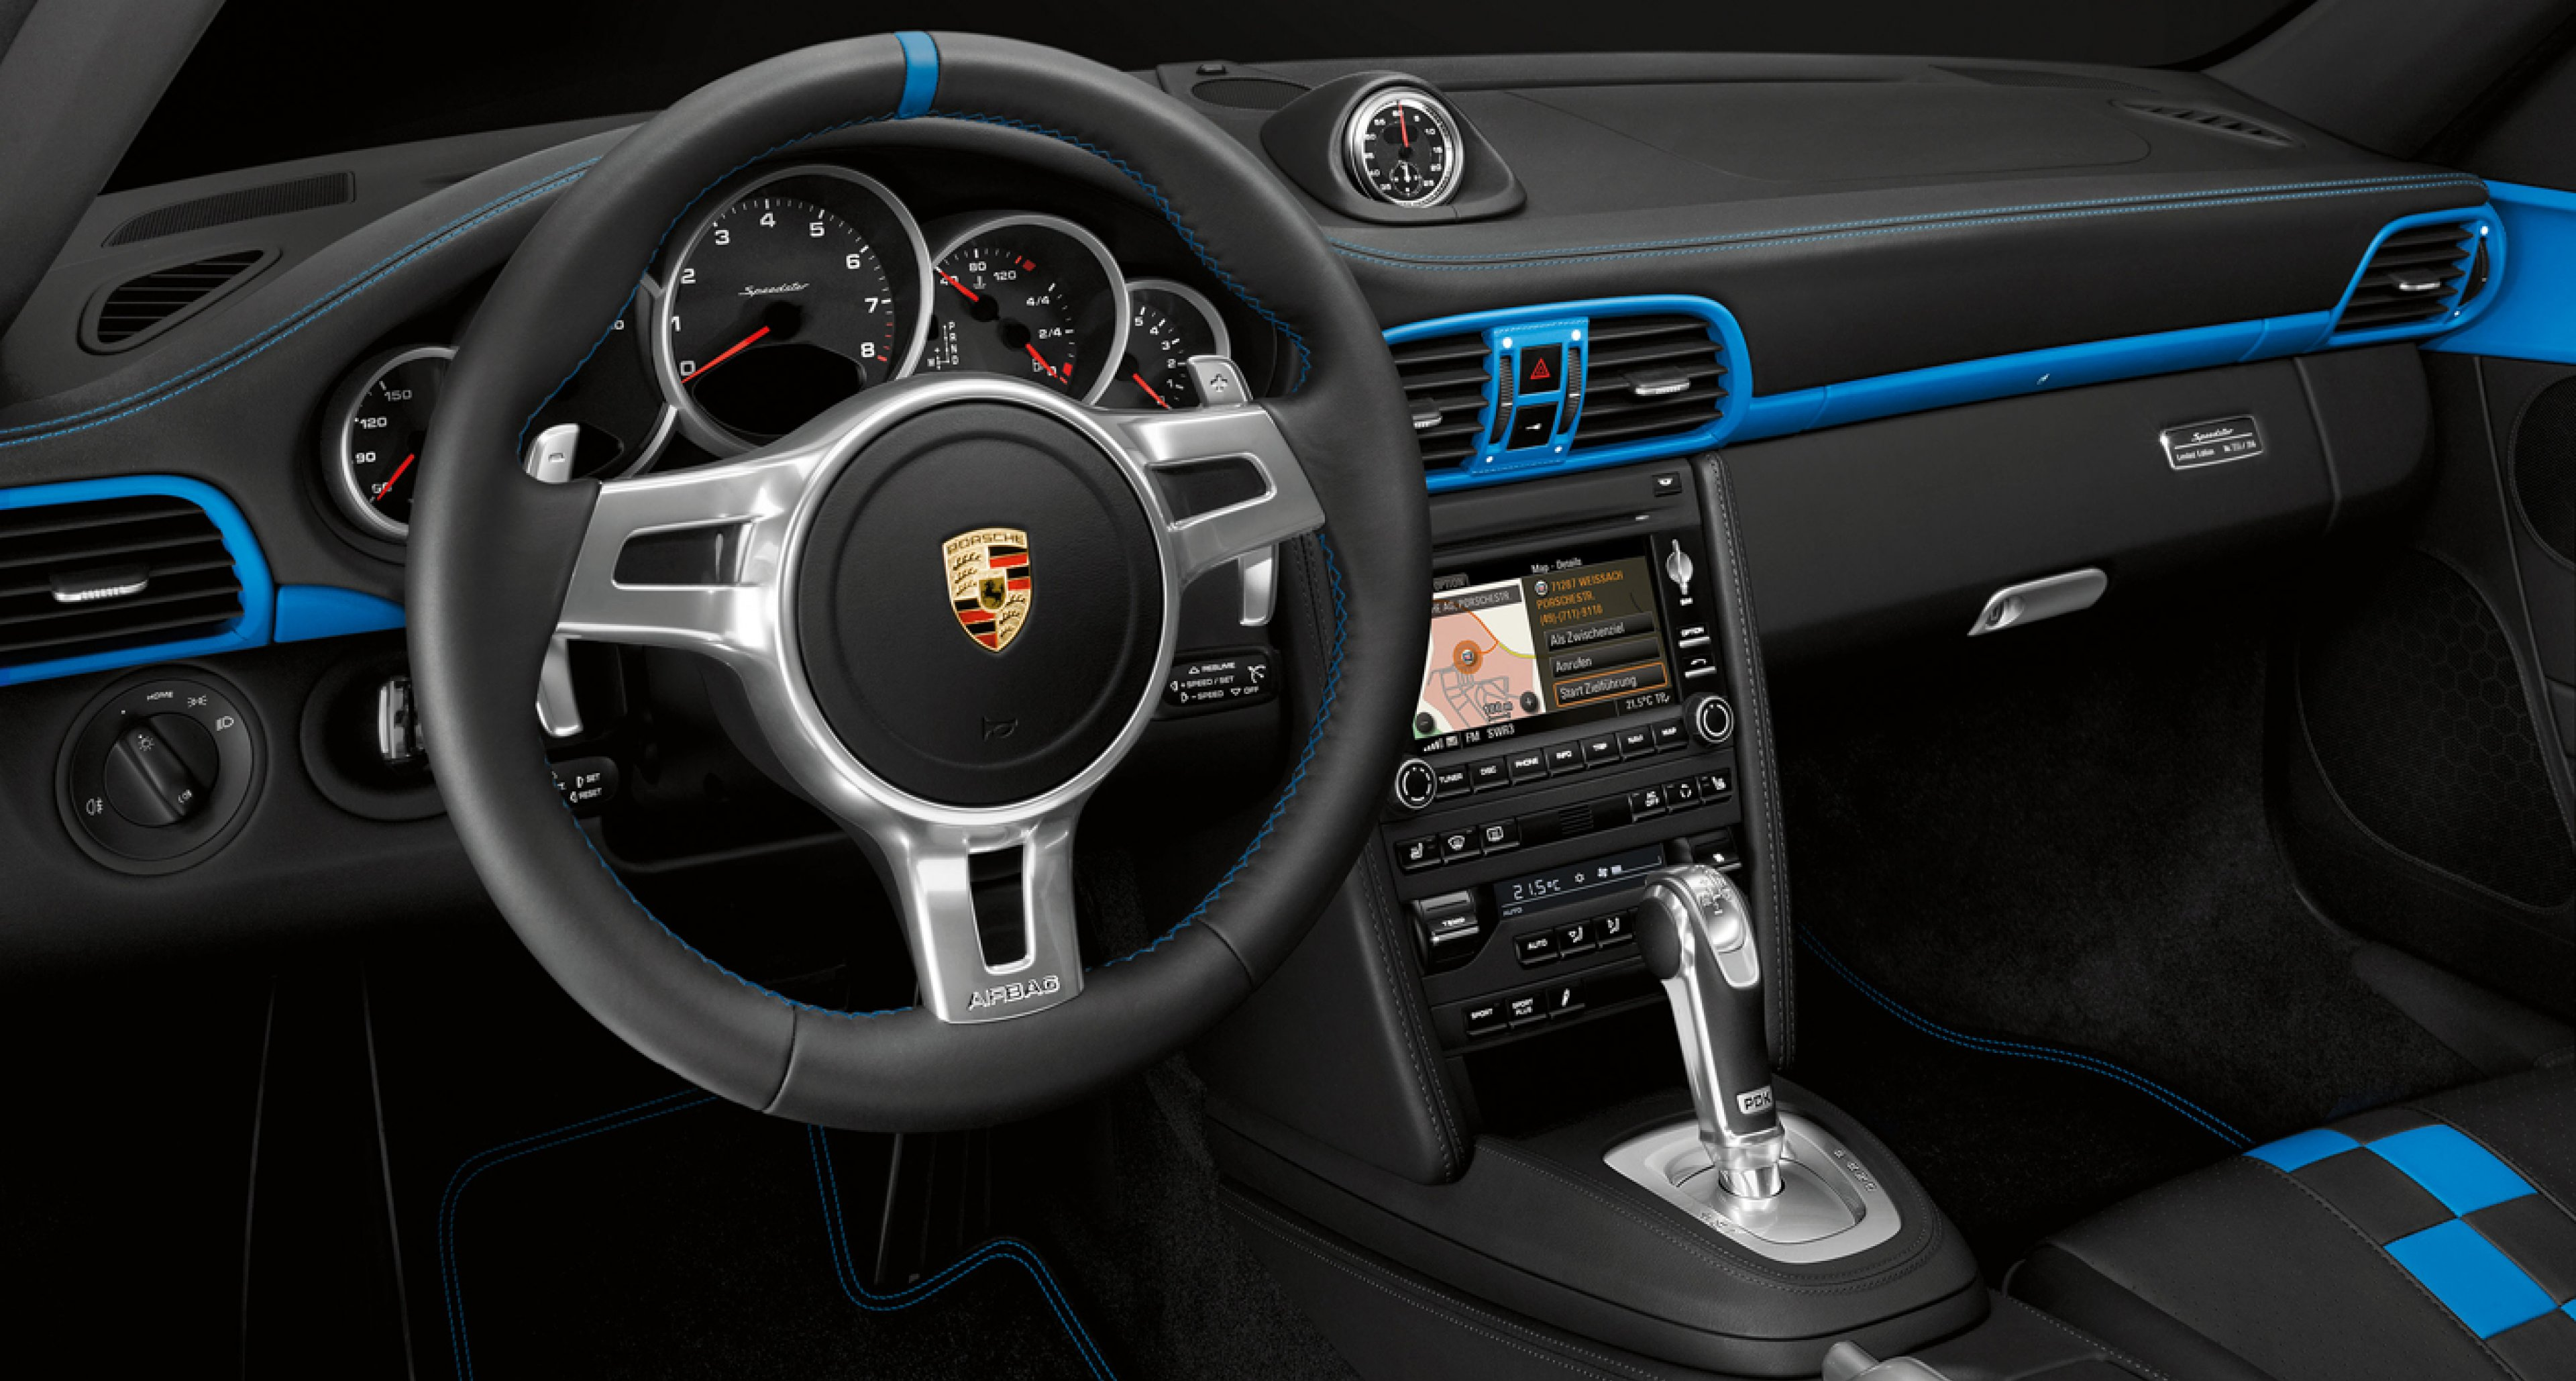 The 2011 Porsche 911 Speedster.